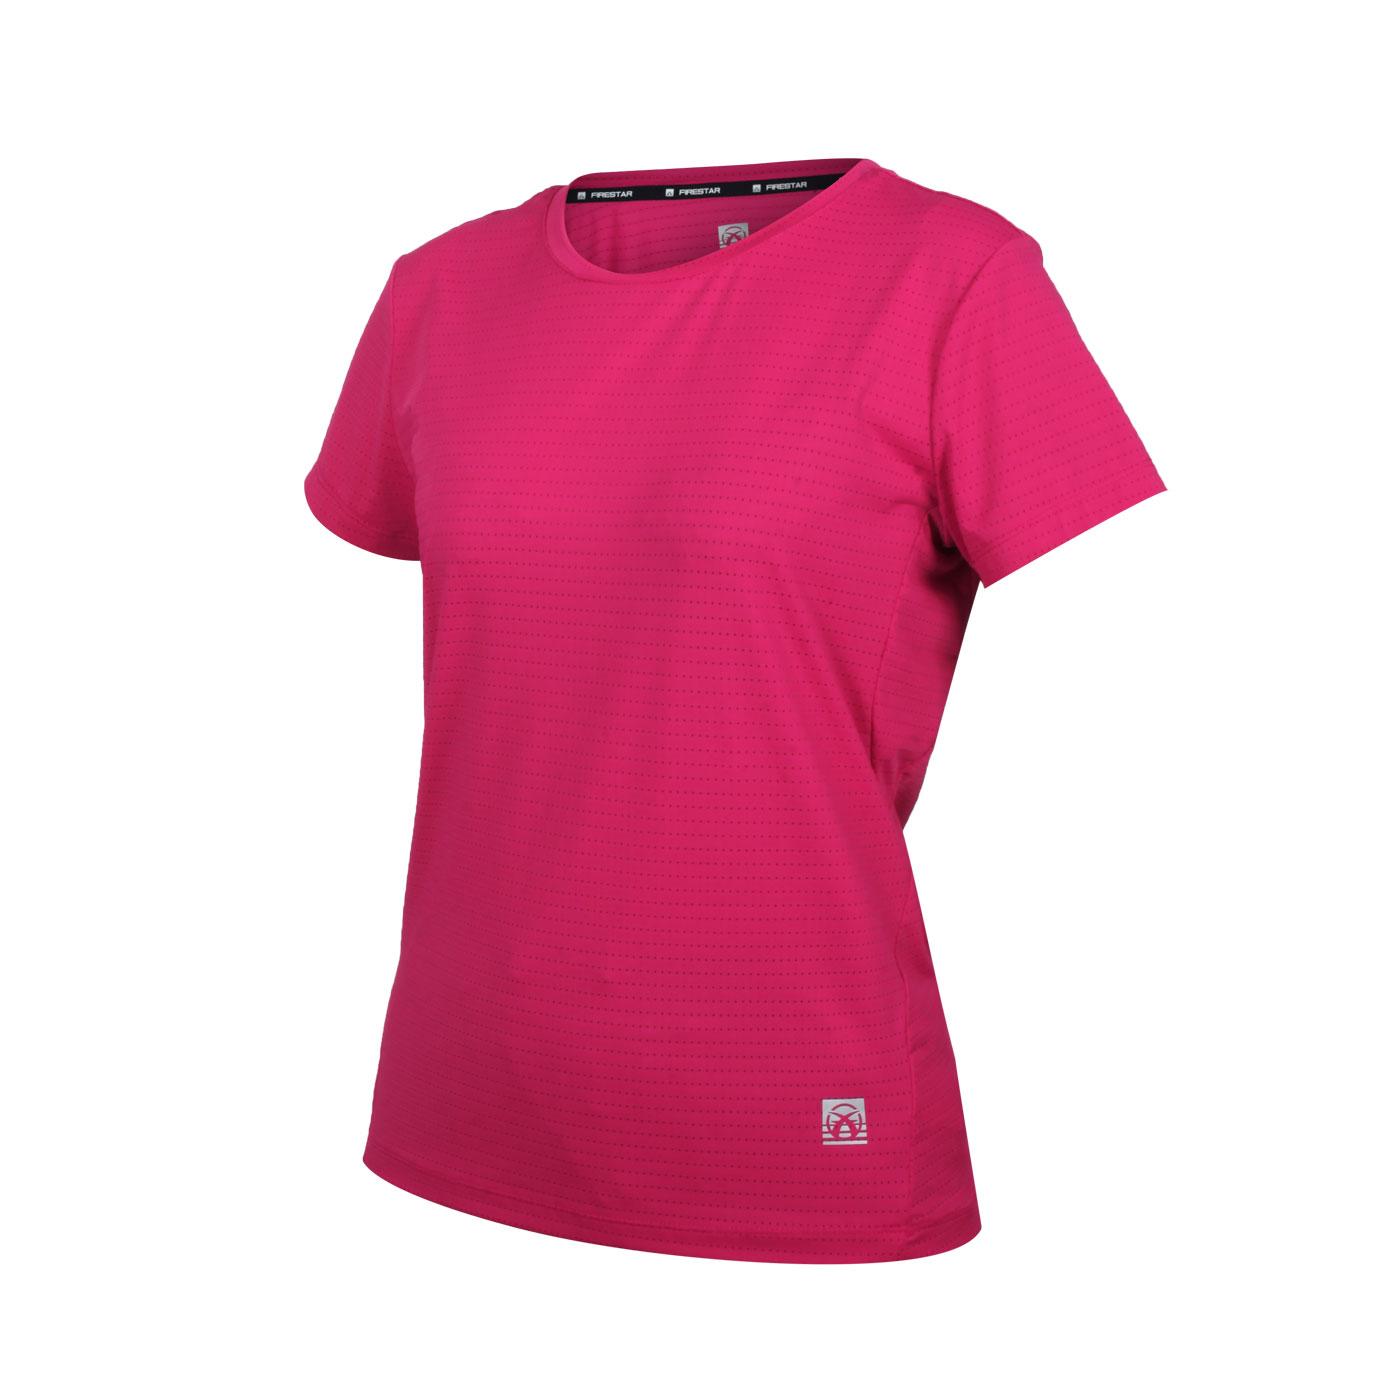 FIRESTAR 女款彈性機能圓領短袖T恤 DL162-43 - 深桃紅